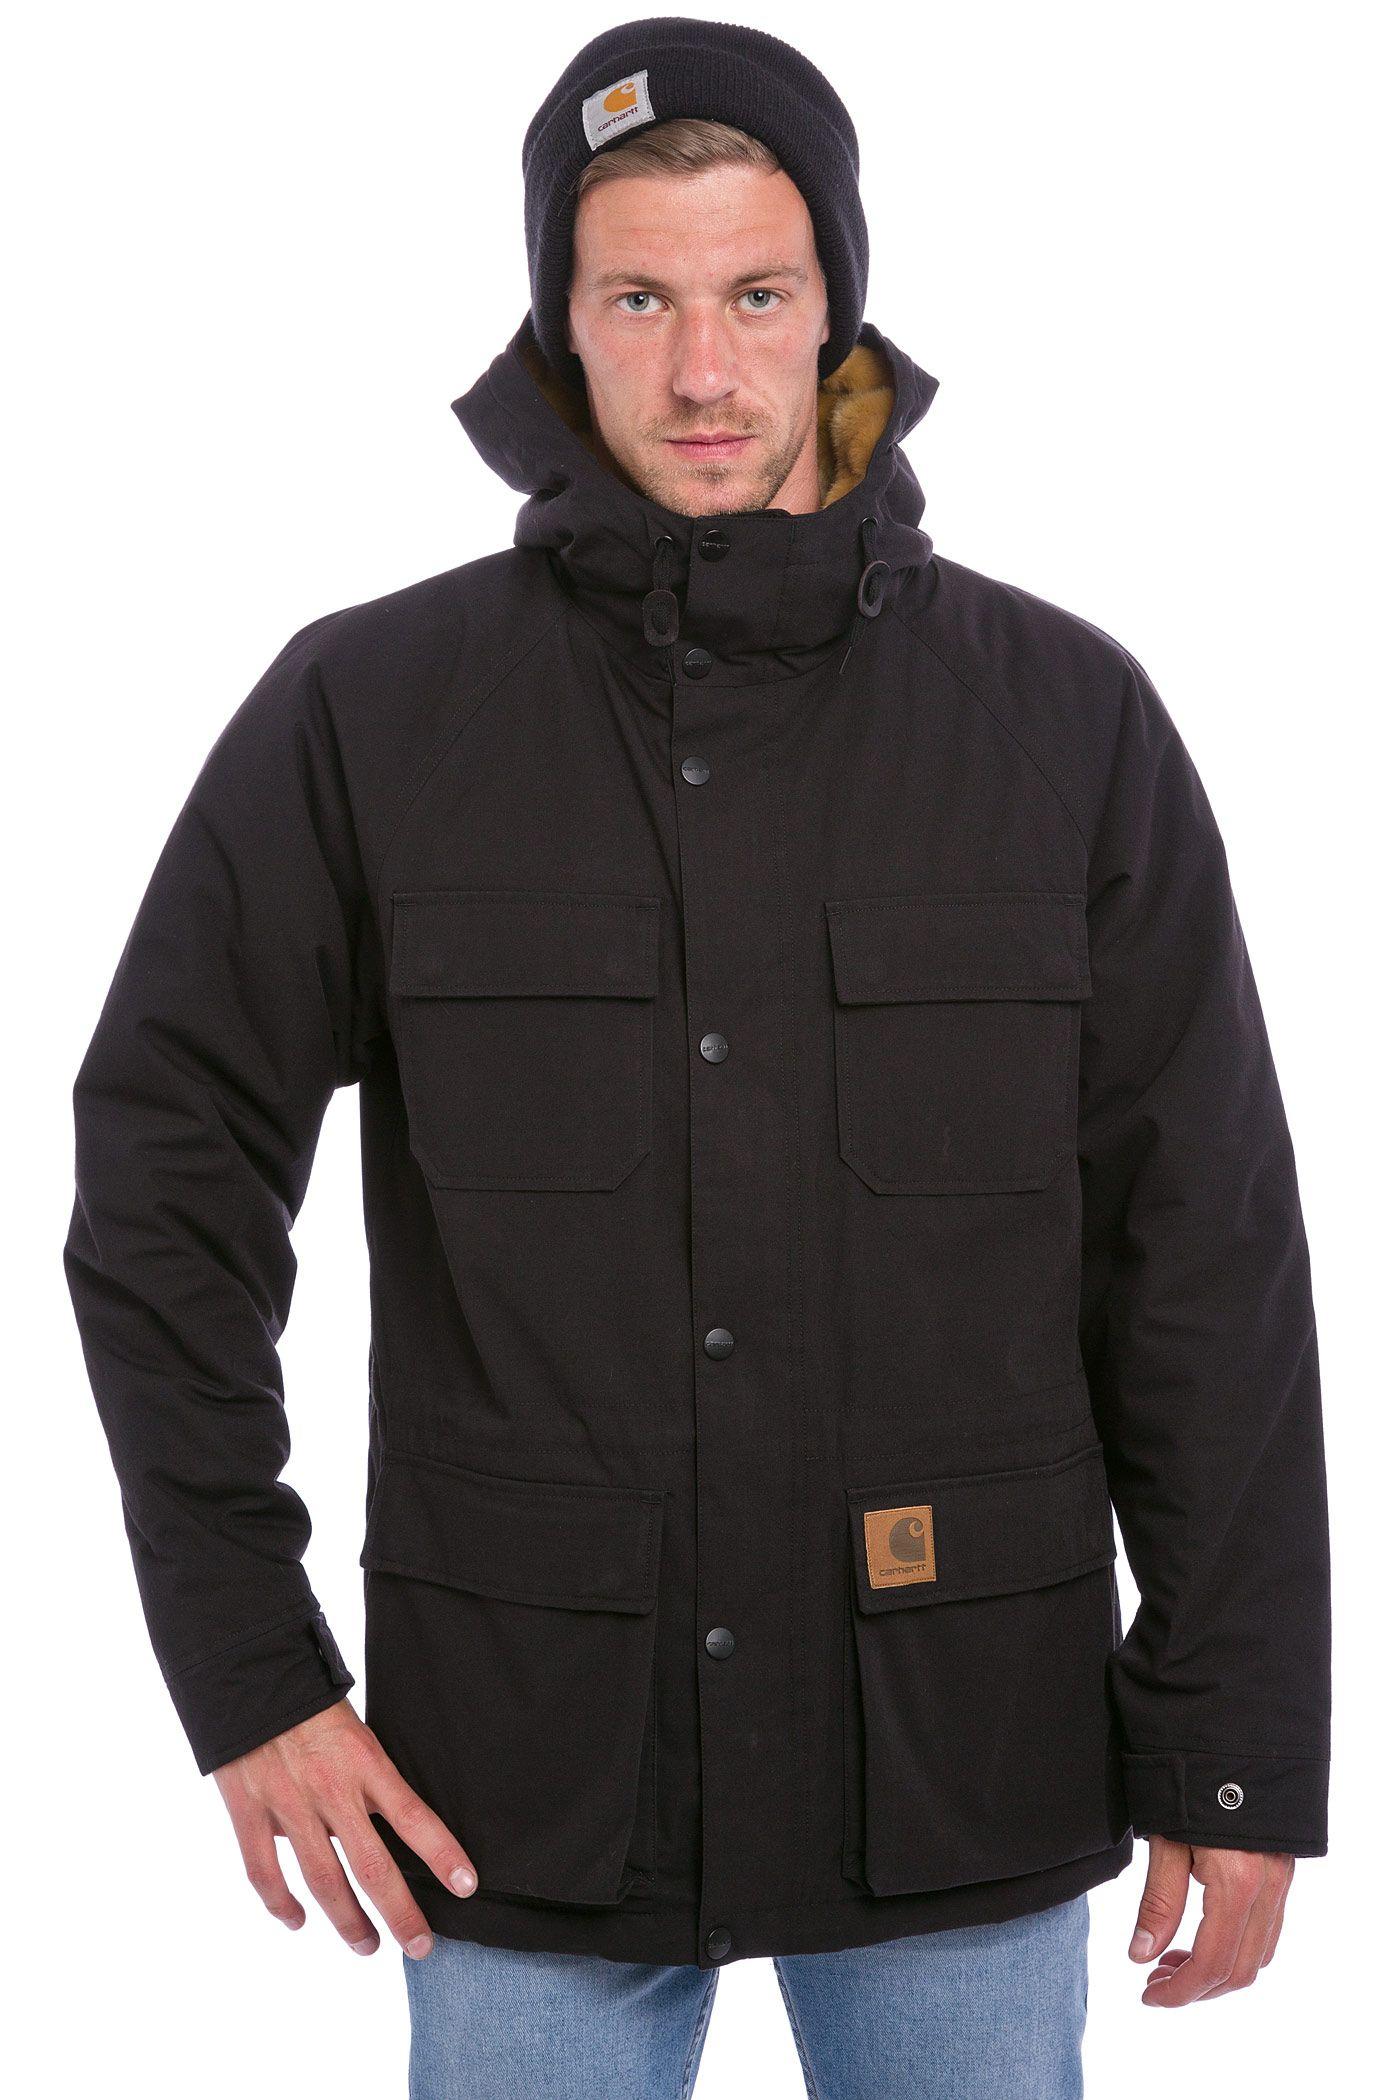 Mentley amp; Carhartt Jacket Wip Clothes Pinterest Style black OwxFn